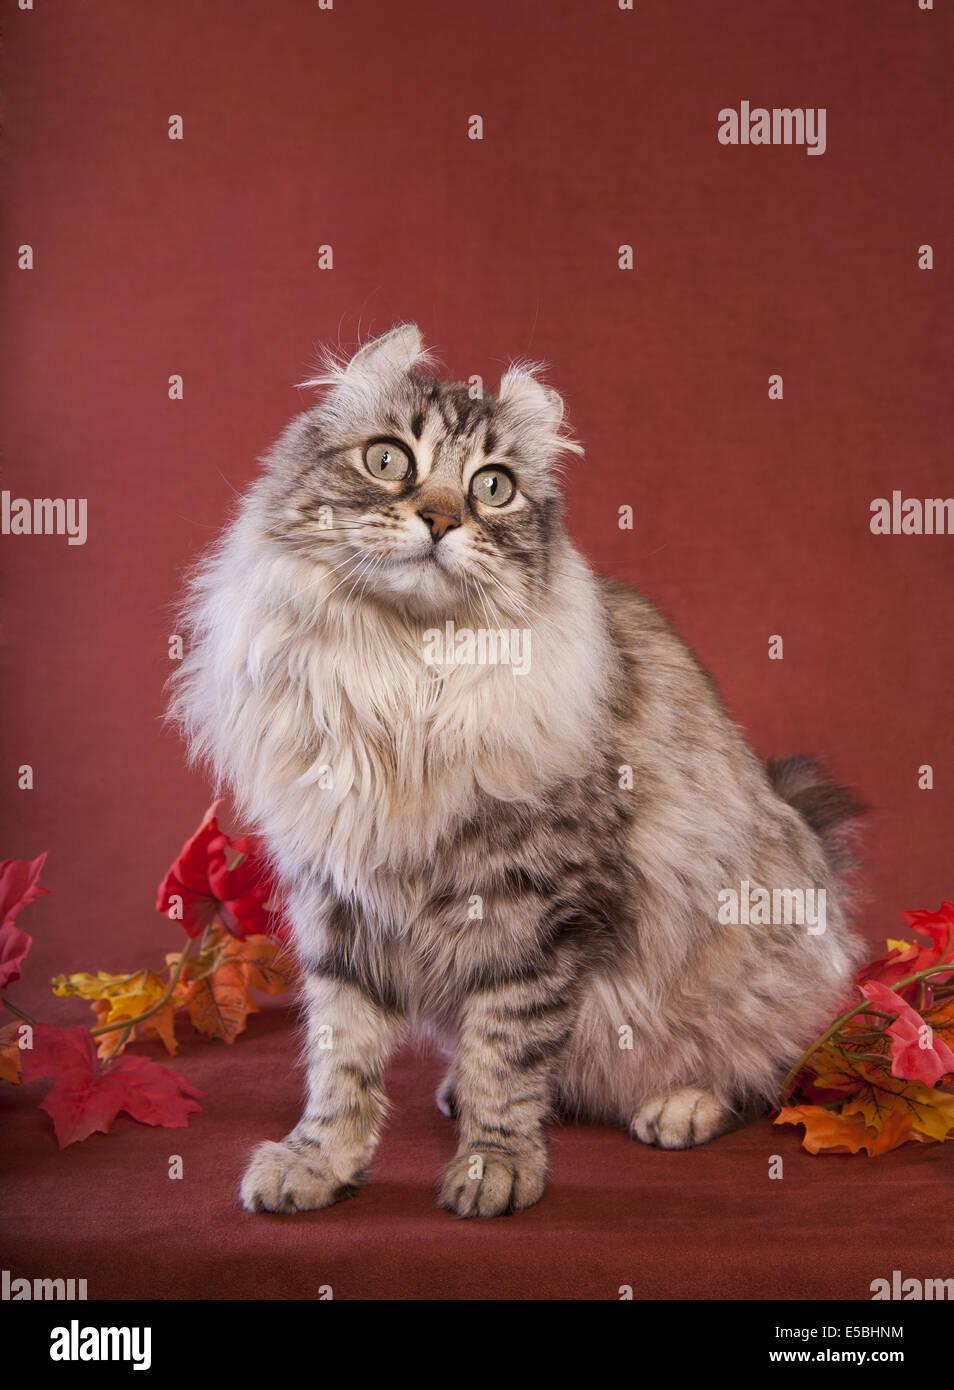 cat lynx autumn foliage - photo #38